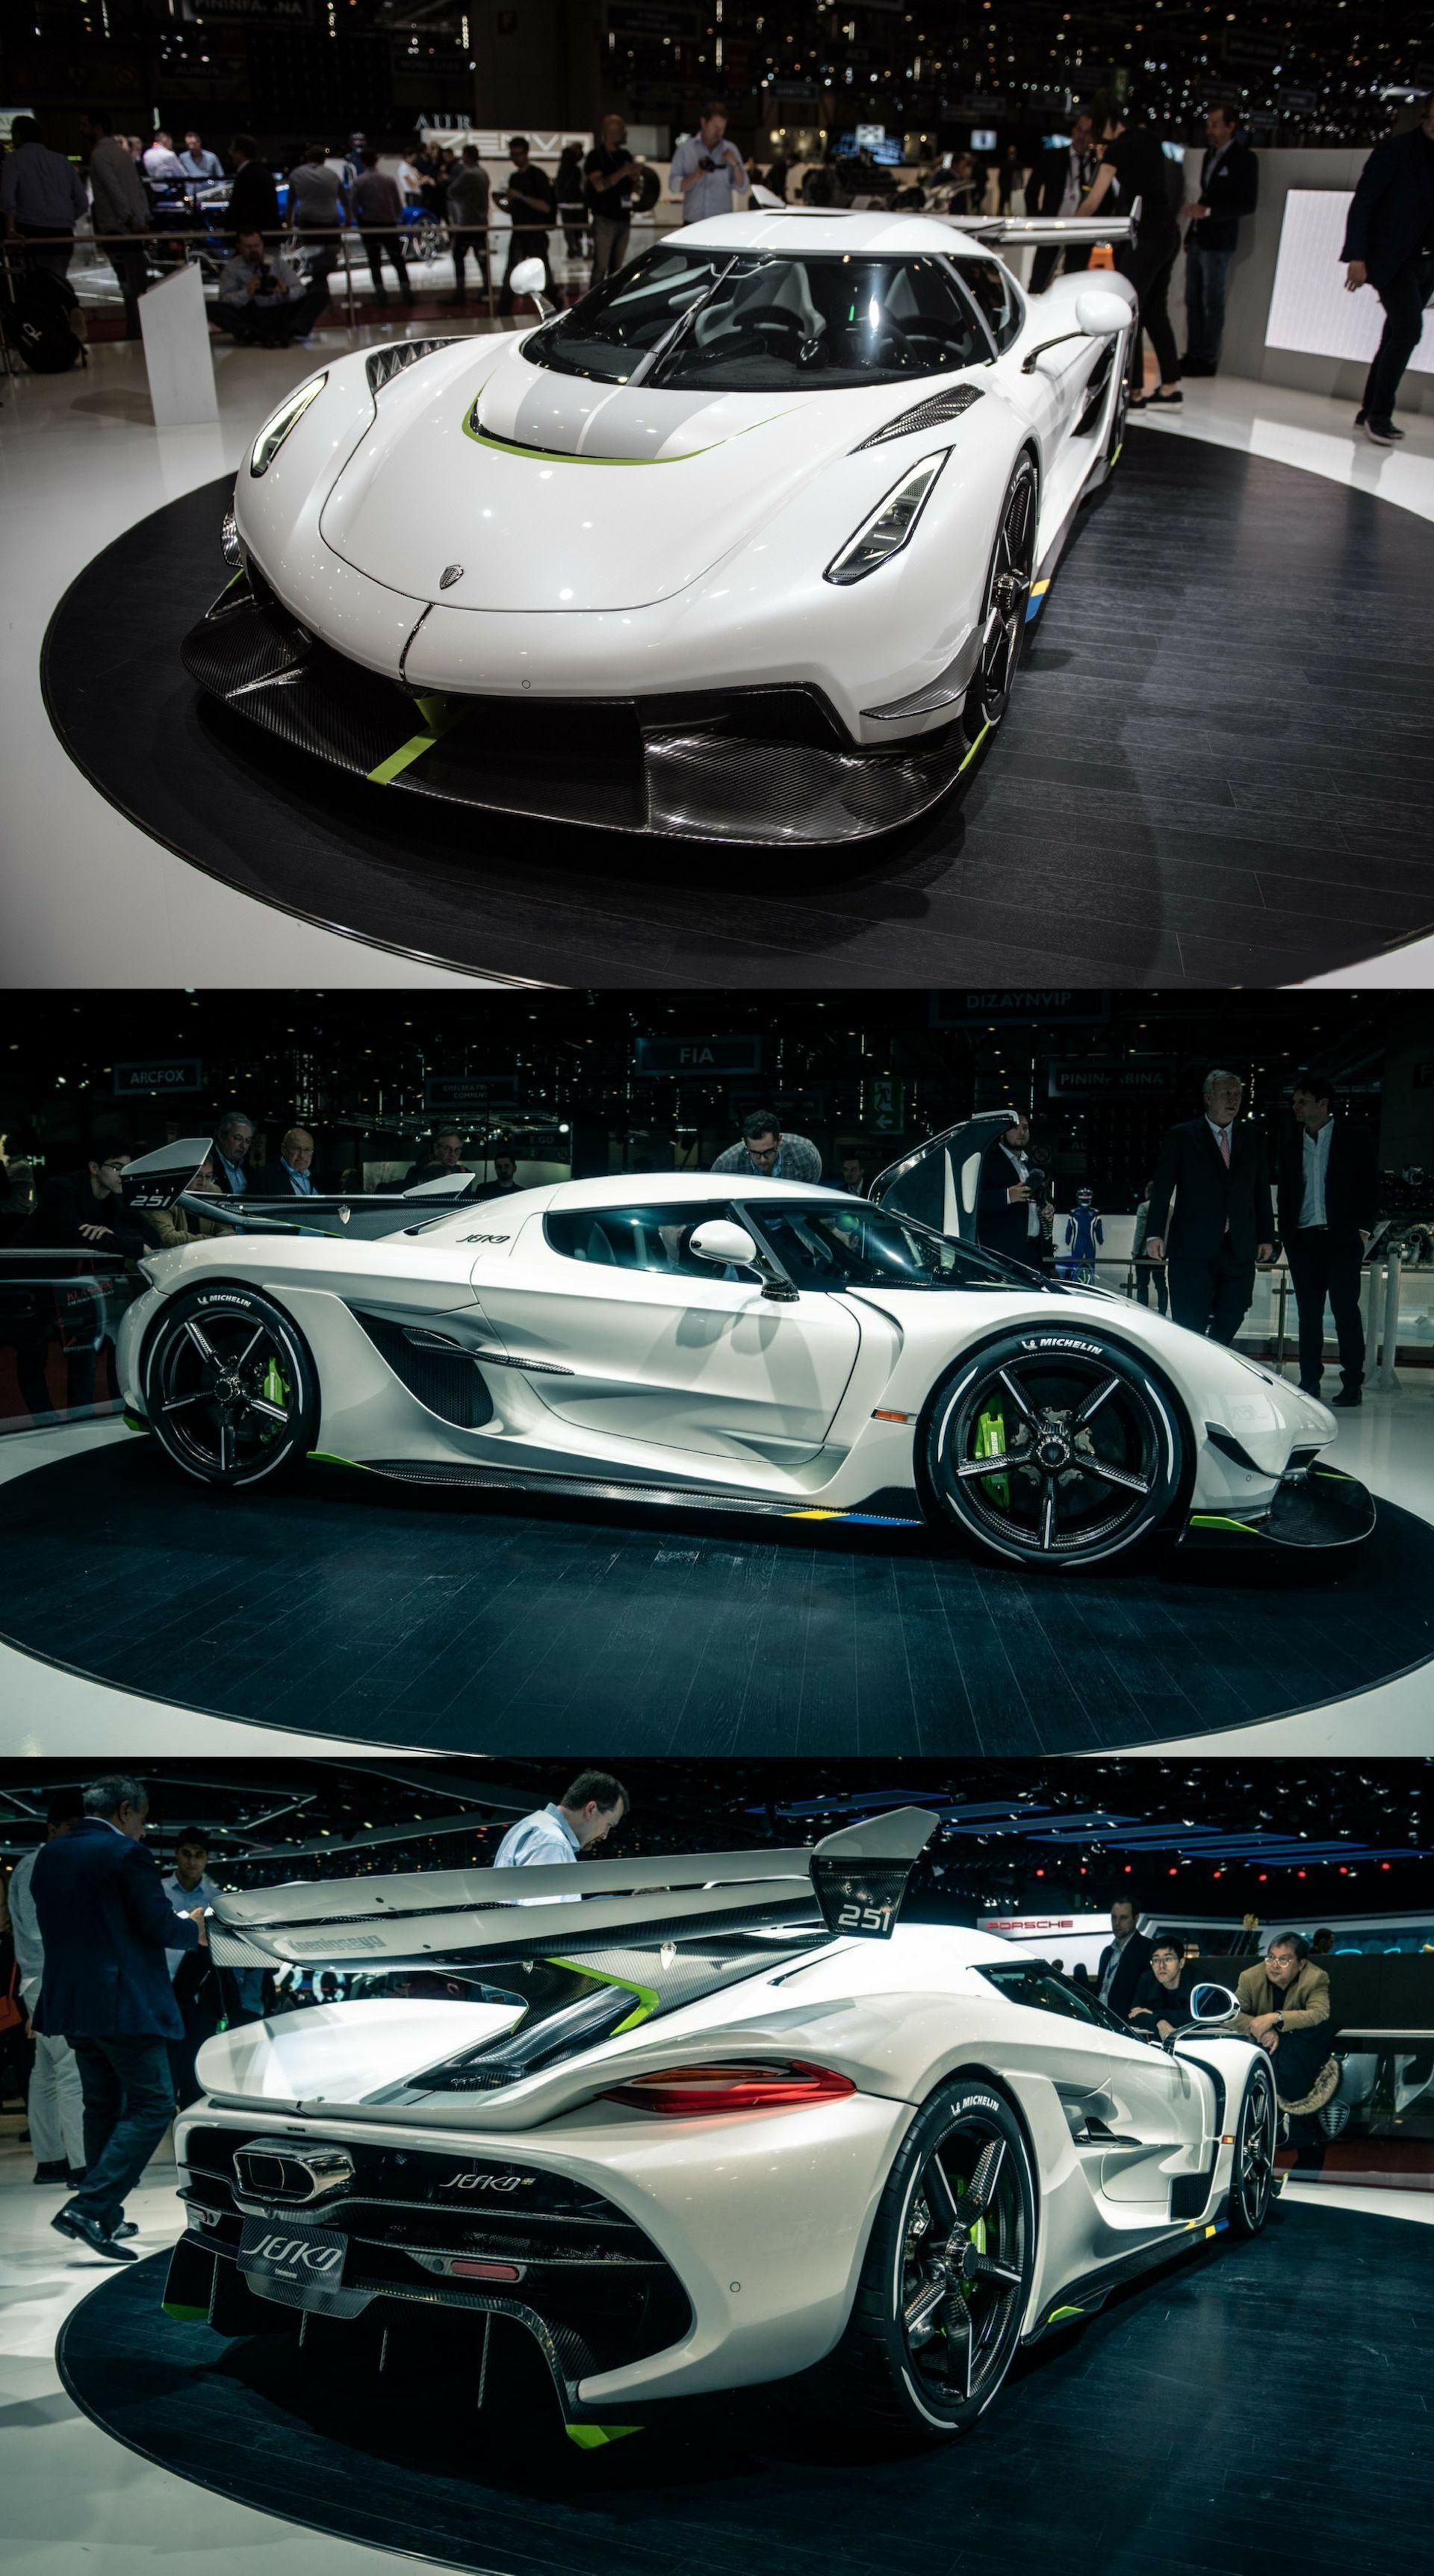 2020 Koenigsegg Jesko With A 5 0 Liter Twin Turbocharged V8 Engine That Makes A Claimed 1 280 Hp On Plain Gaso Luxury Car Interior Koenigsegg Luxury Cars Audi